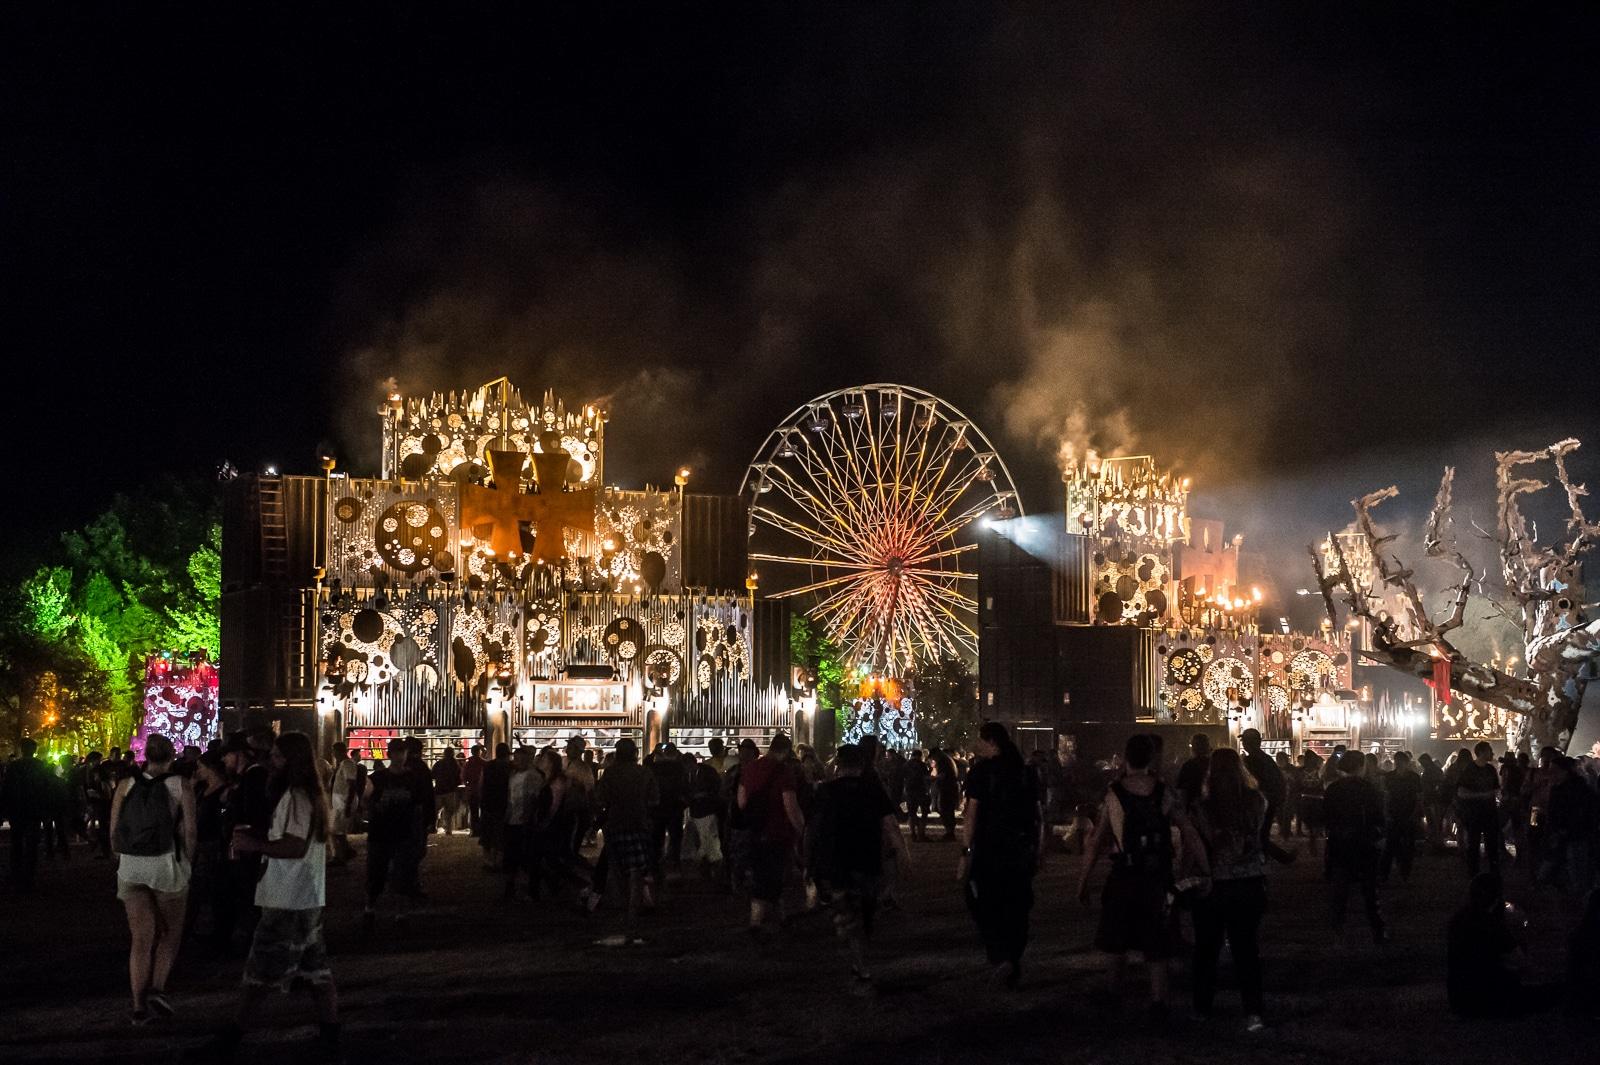 Летние европейские фестивали. HellFest 2014. Клиссон. Франция